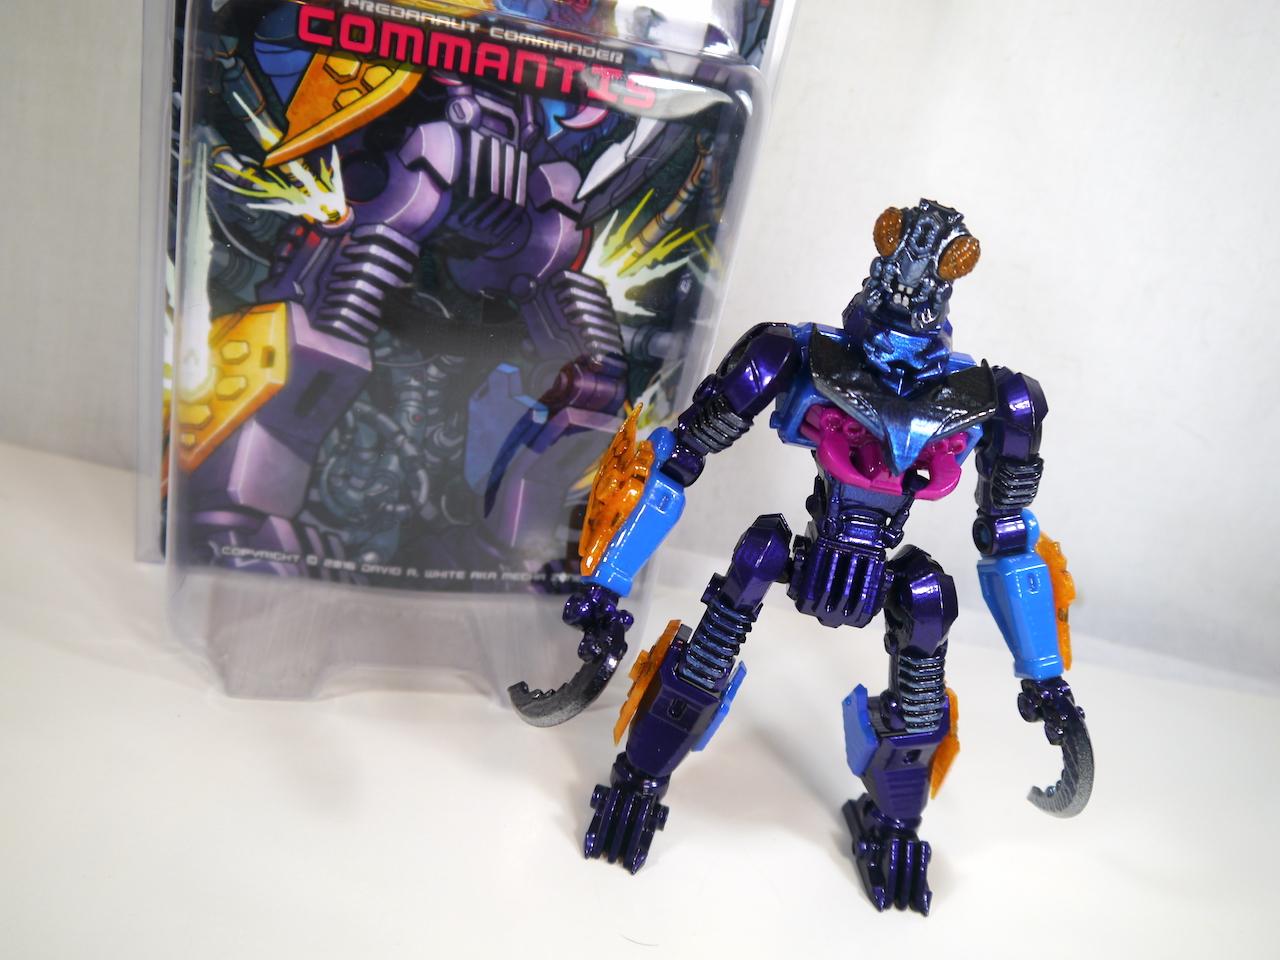 Mechanauts Predanauts Commander Commantis Toy Review